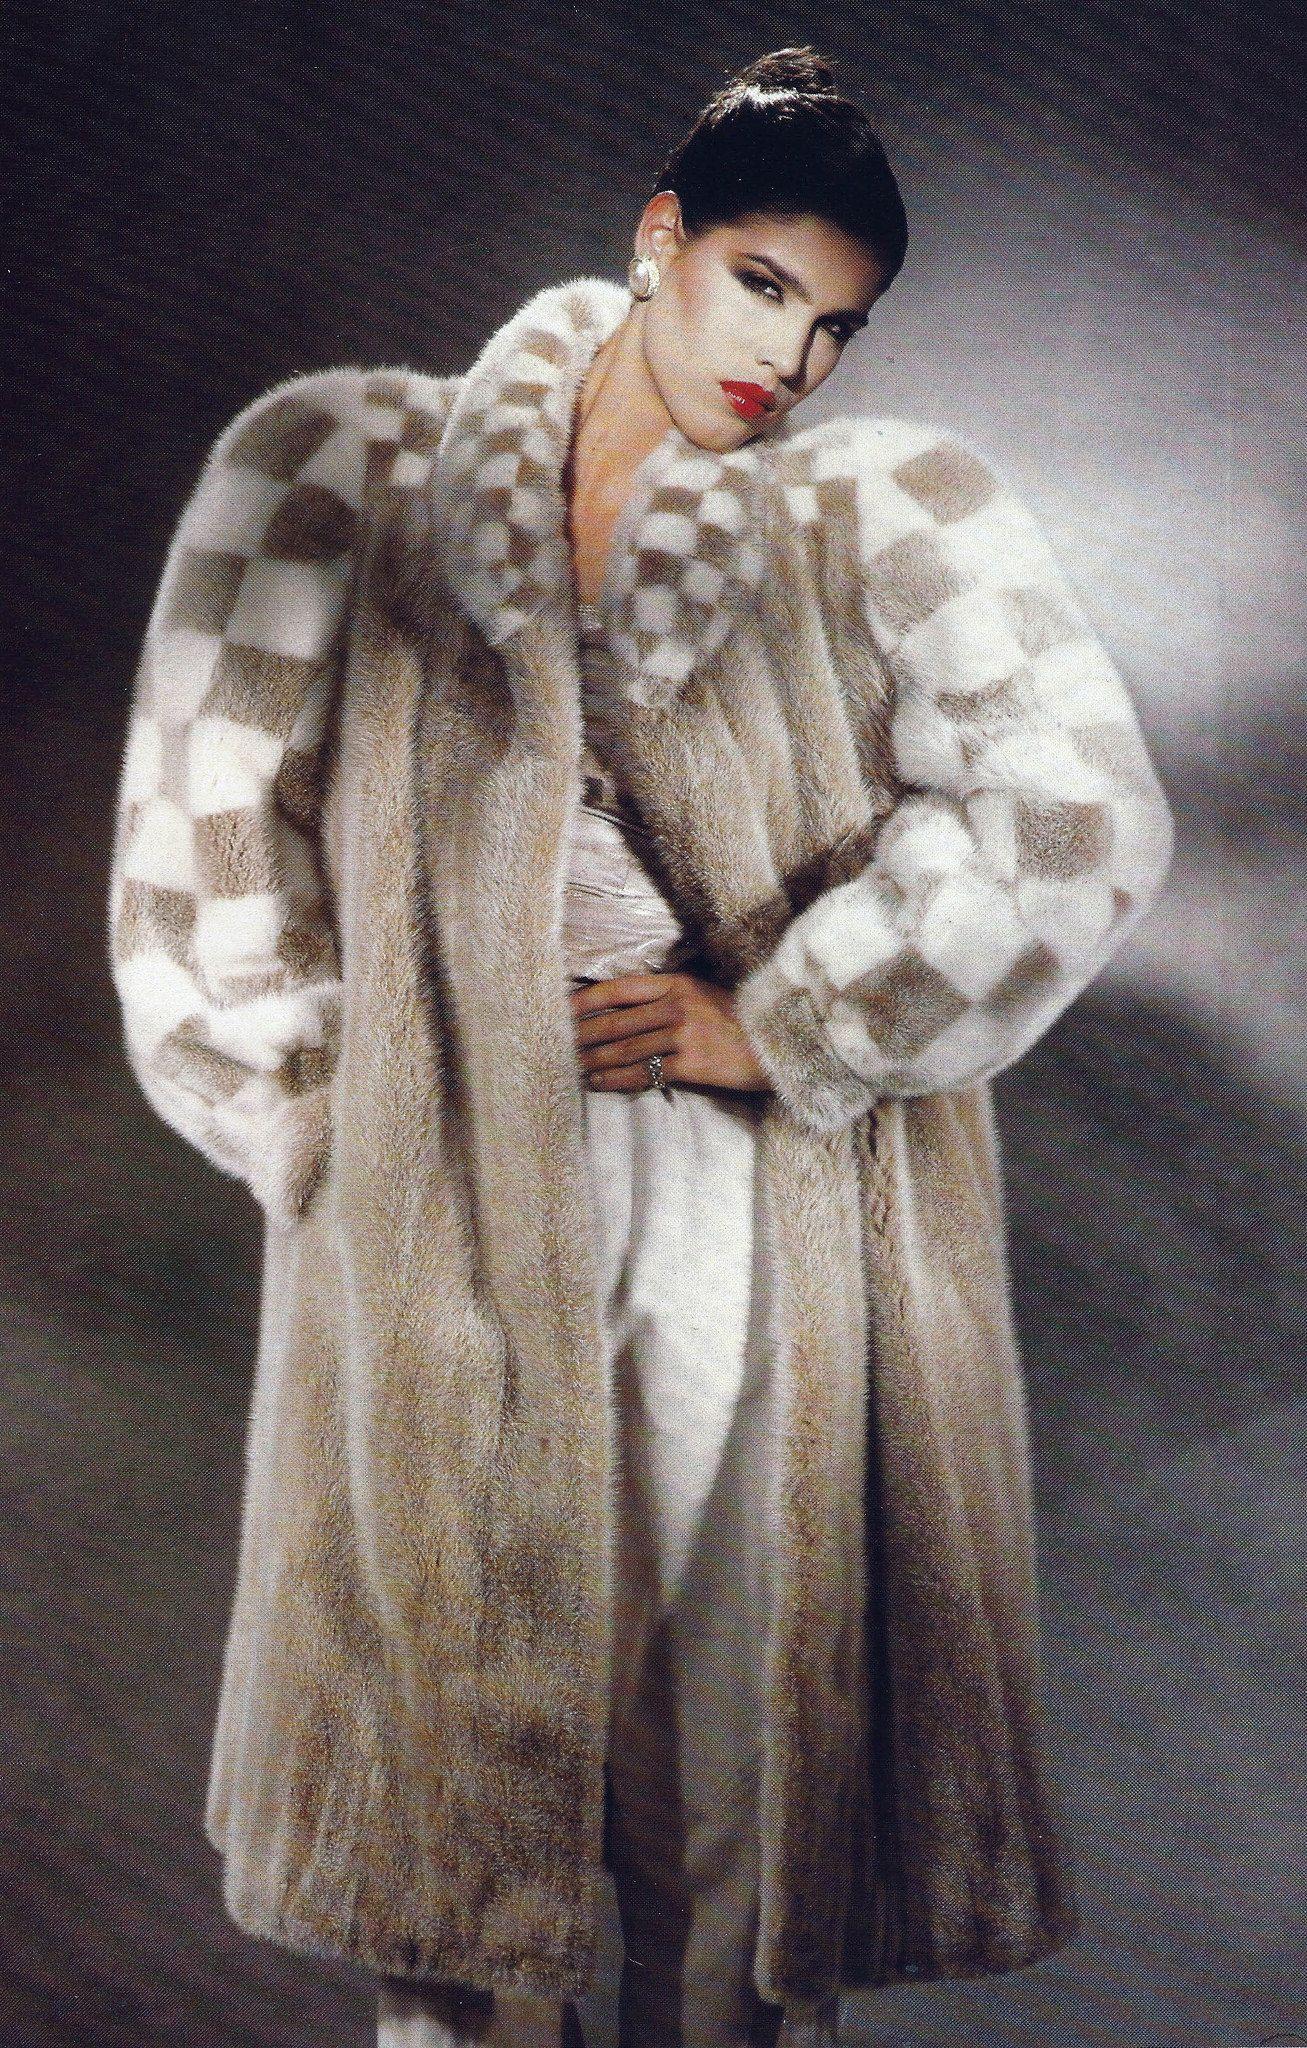 Madame Fur Coat Vintage Fur Coat White Fur Coat